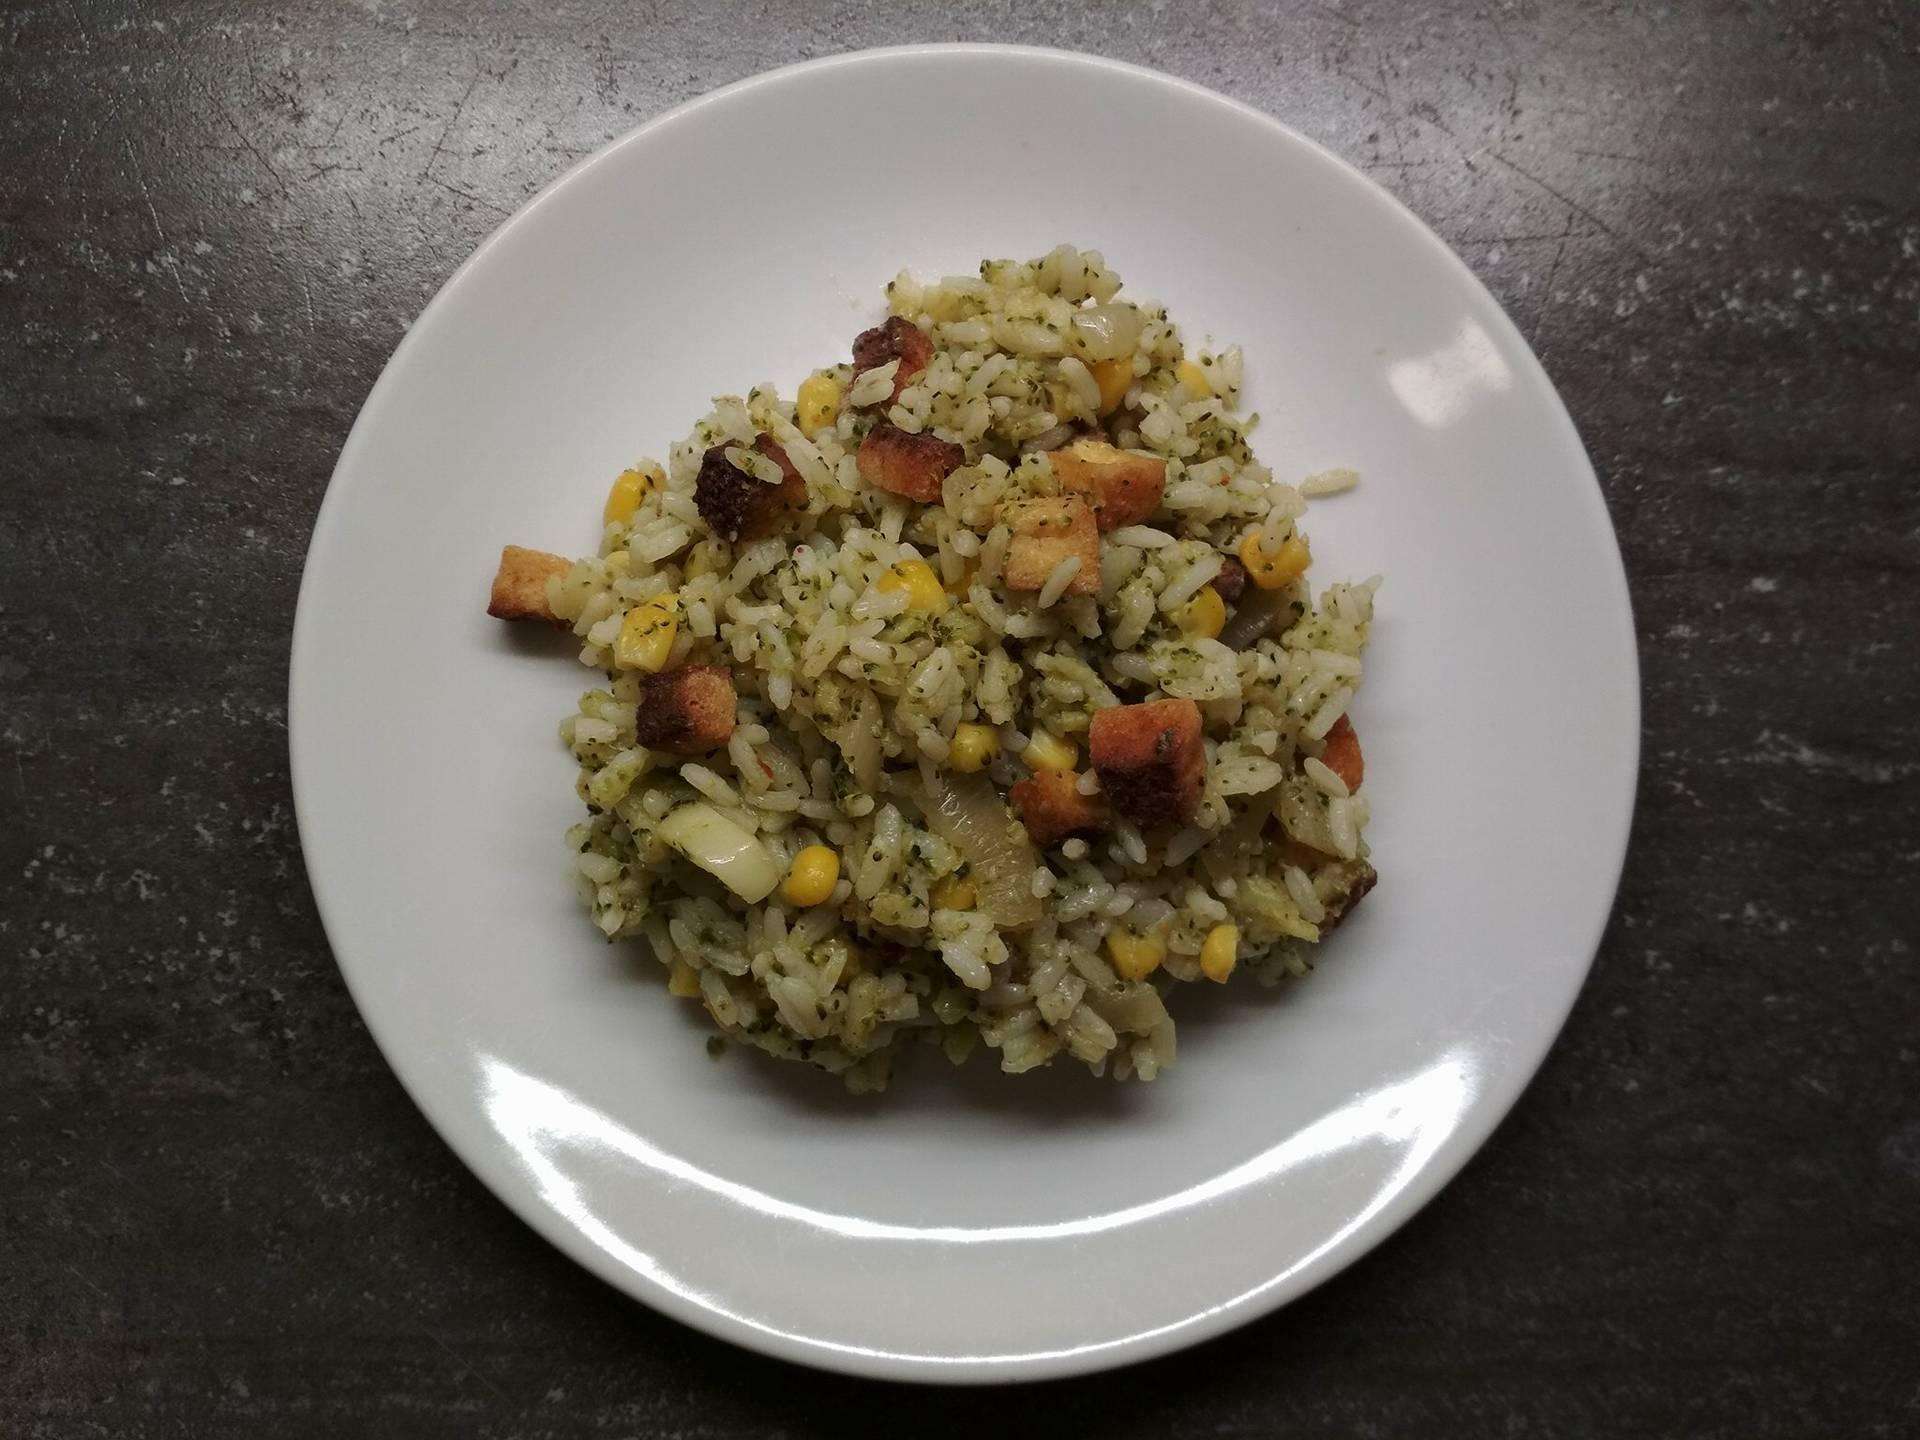 Brokolicové rizoto s křupavým tofu